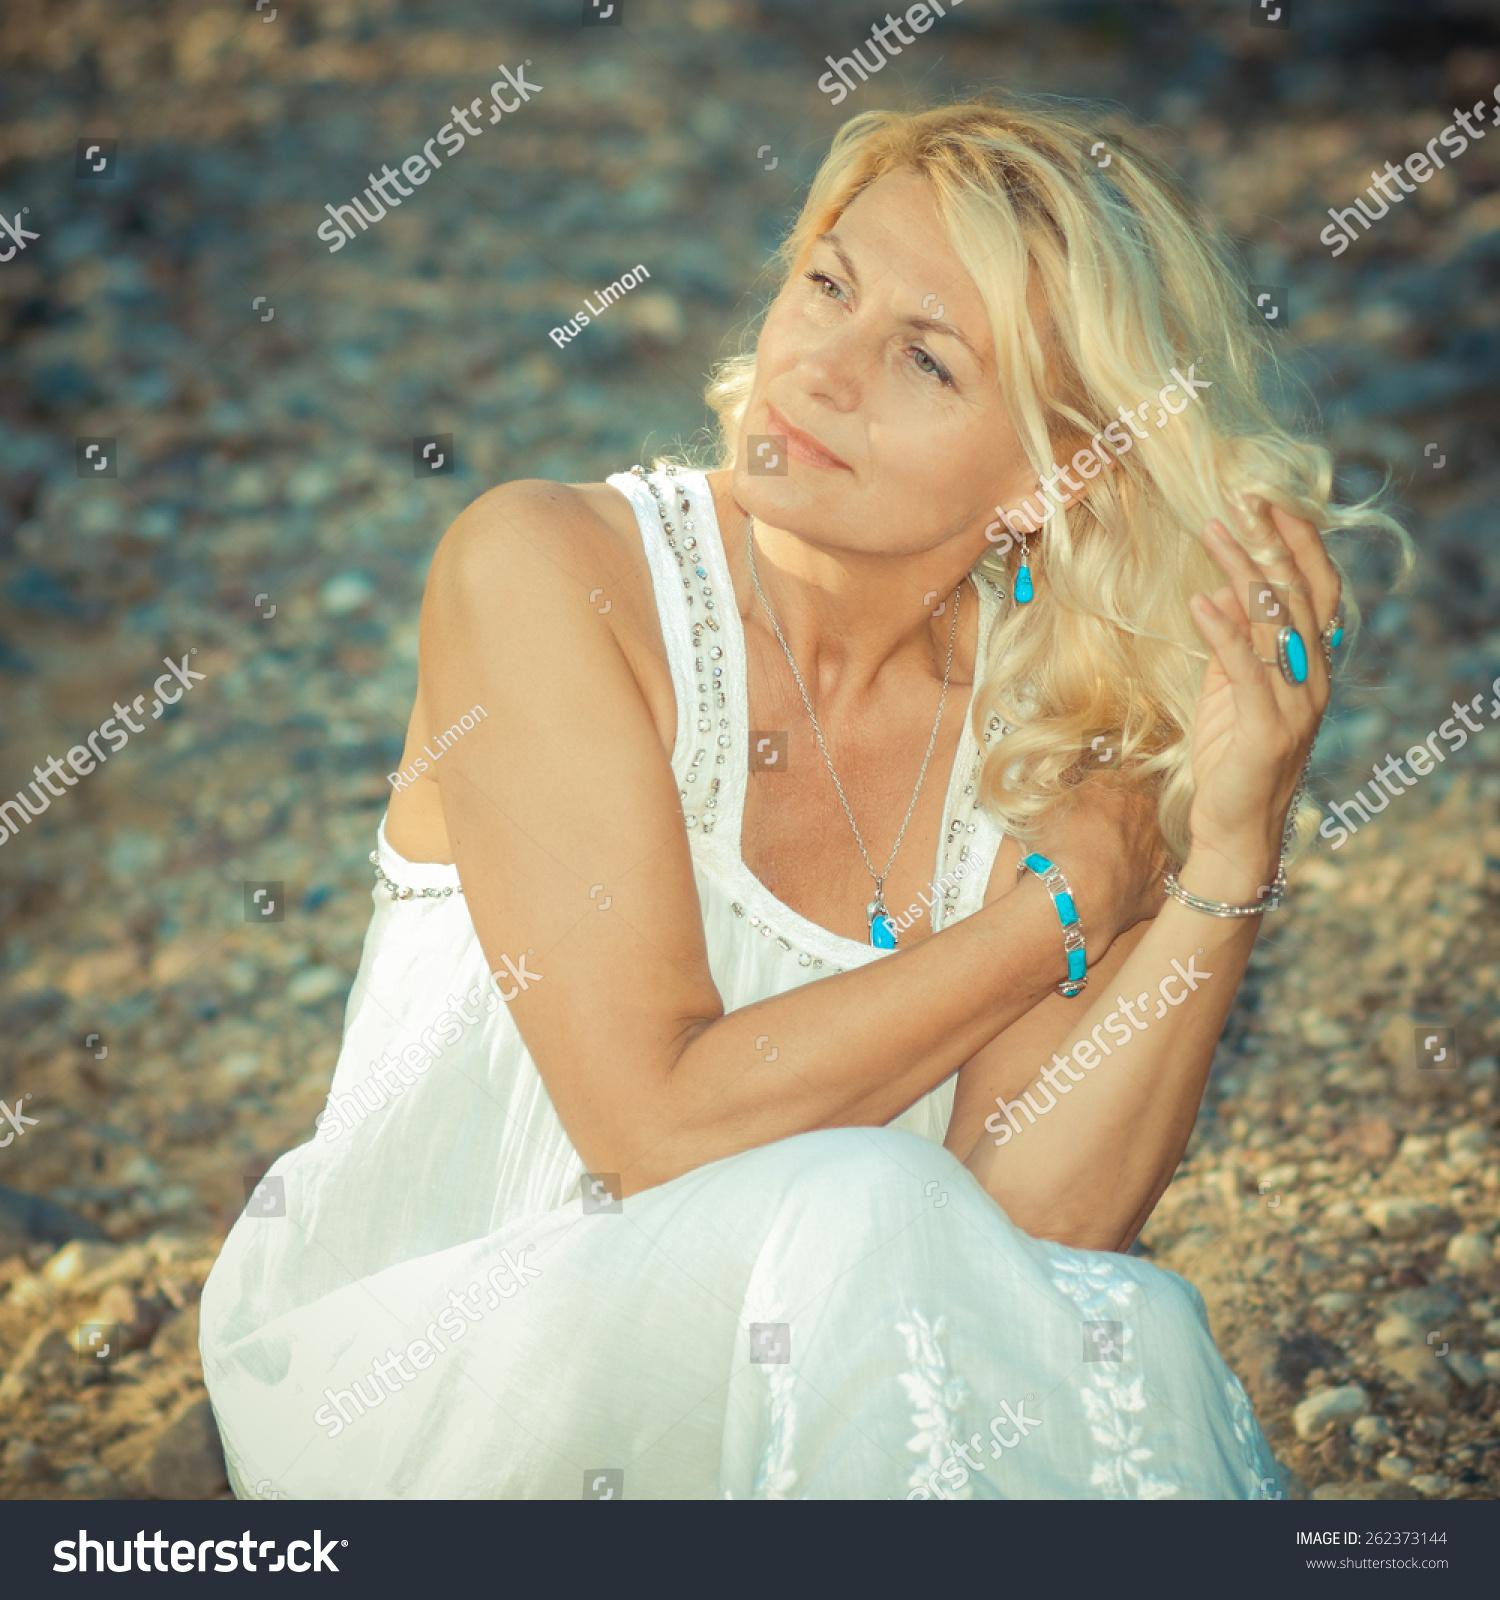 Playlist results for moldova bride